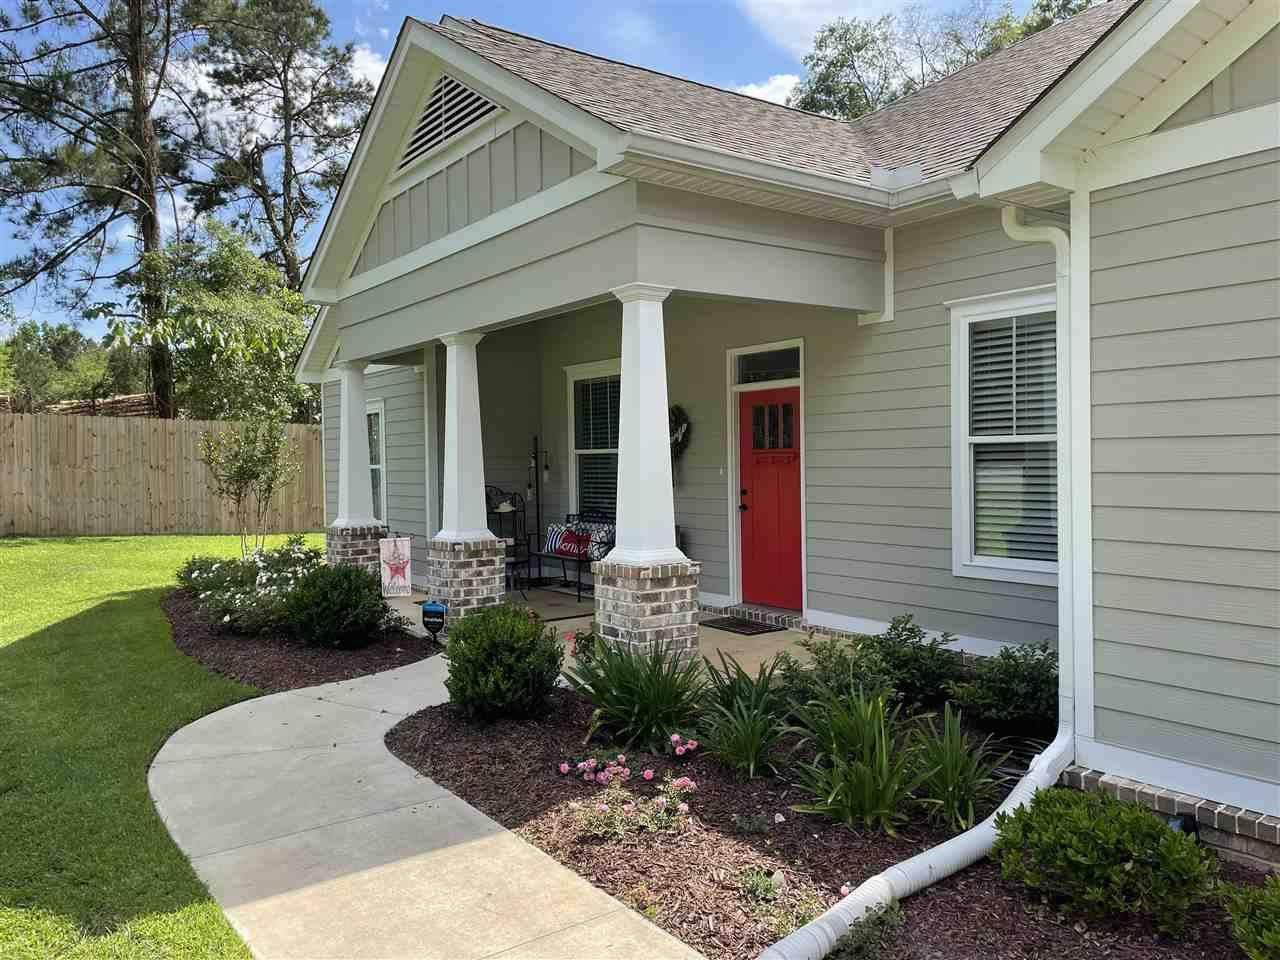 Photo of 8324 N Shenandoah Drive, TALLAHASSEE, FL 32317 (MLS # 333252)